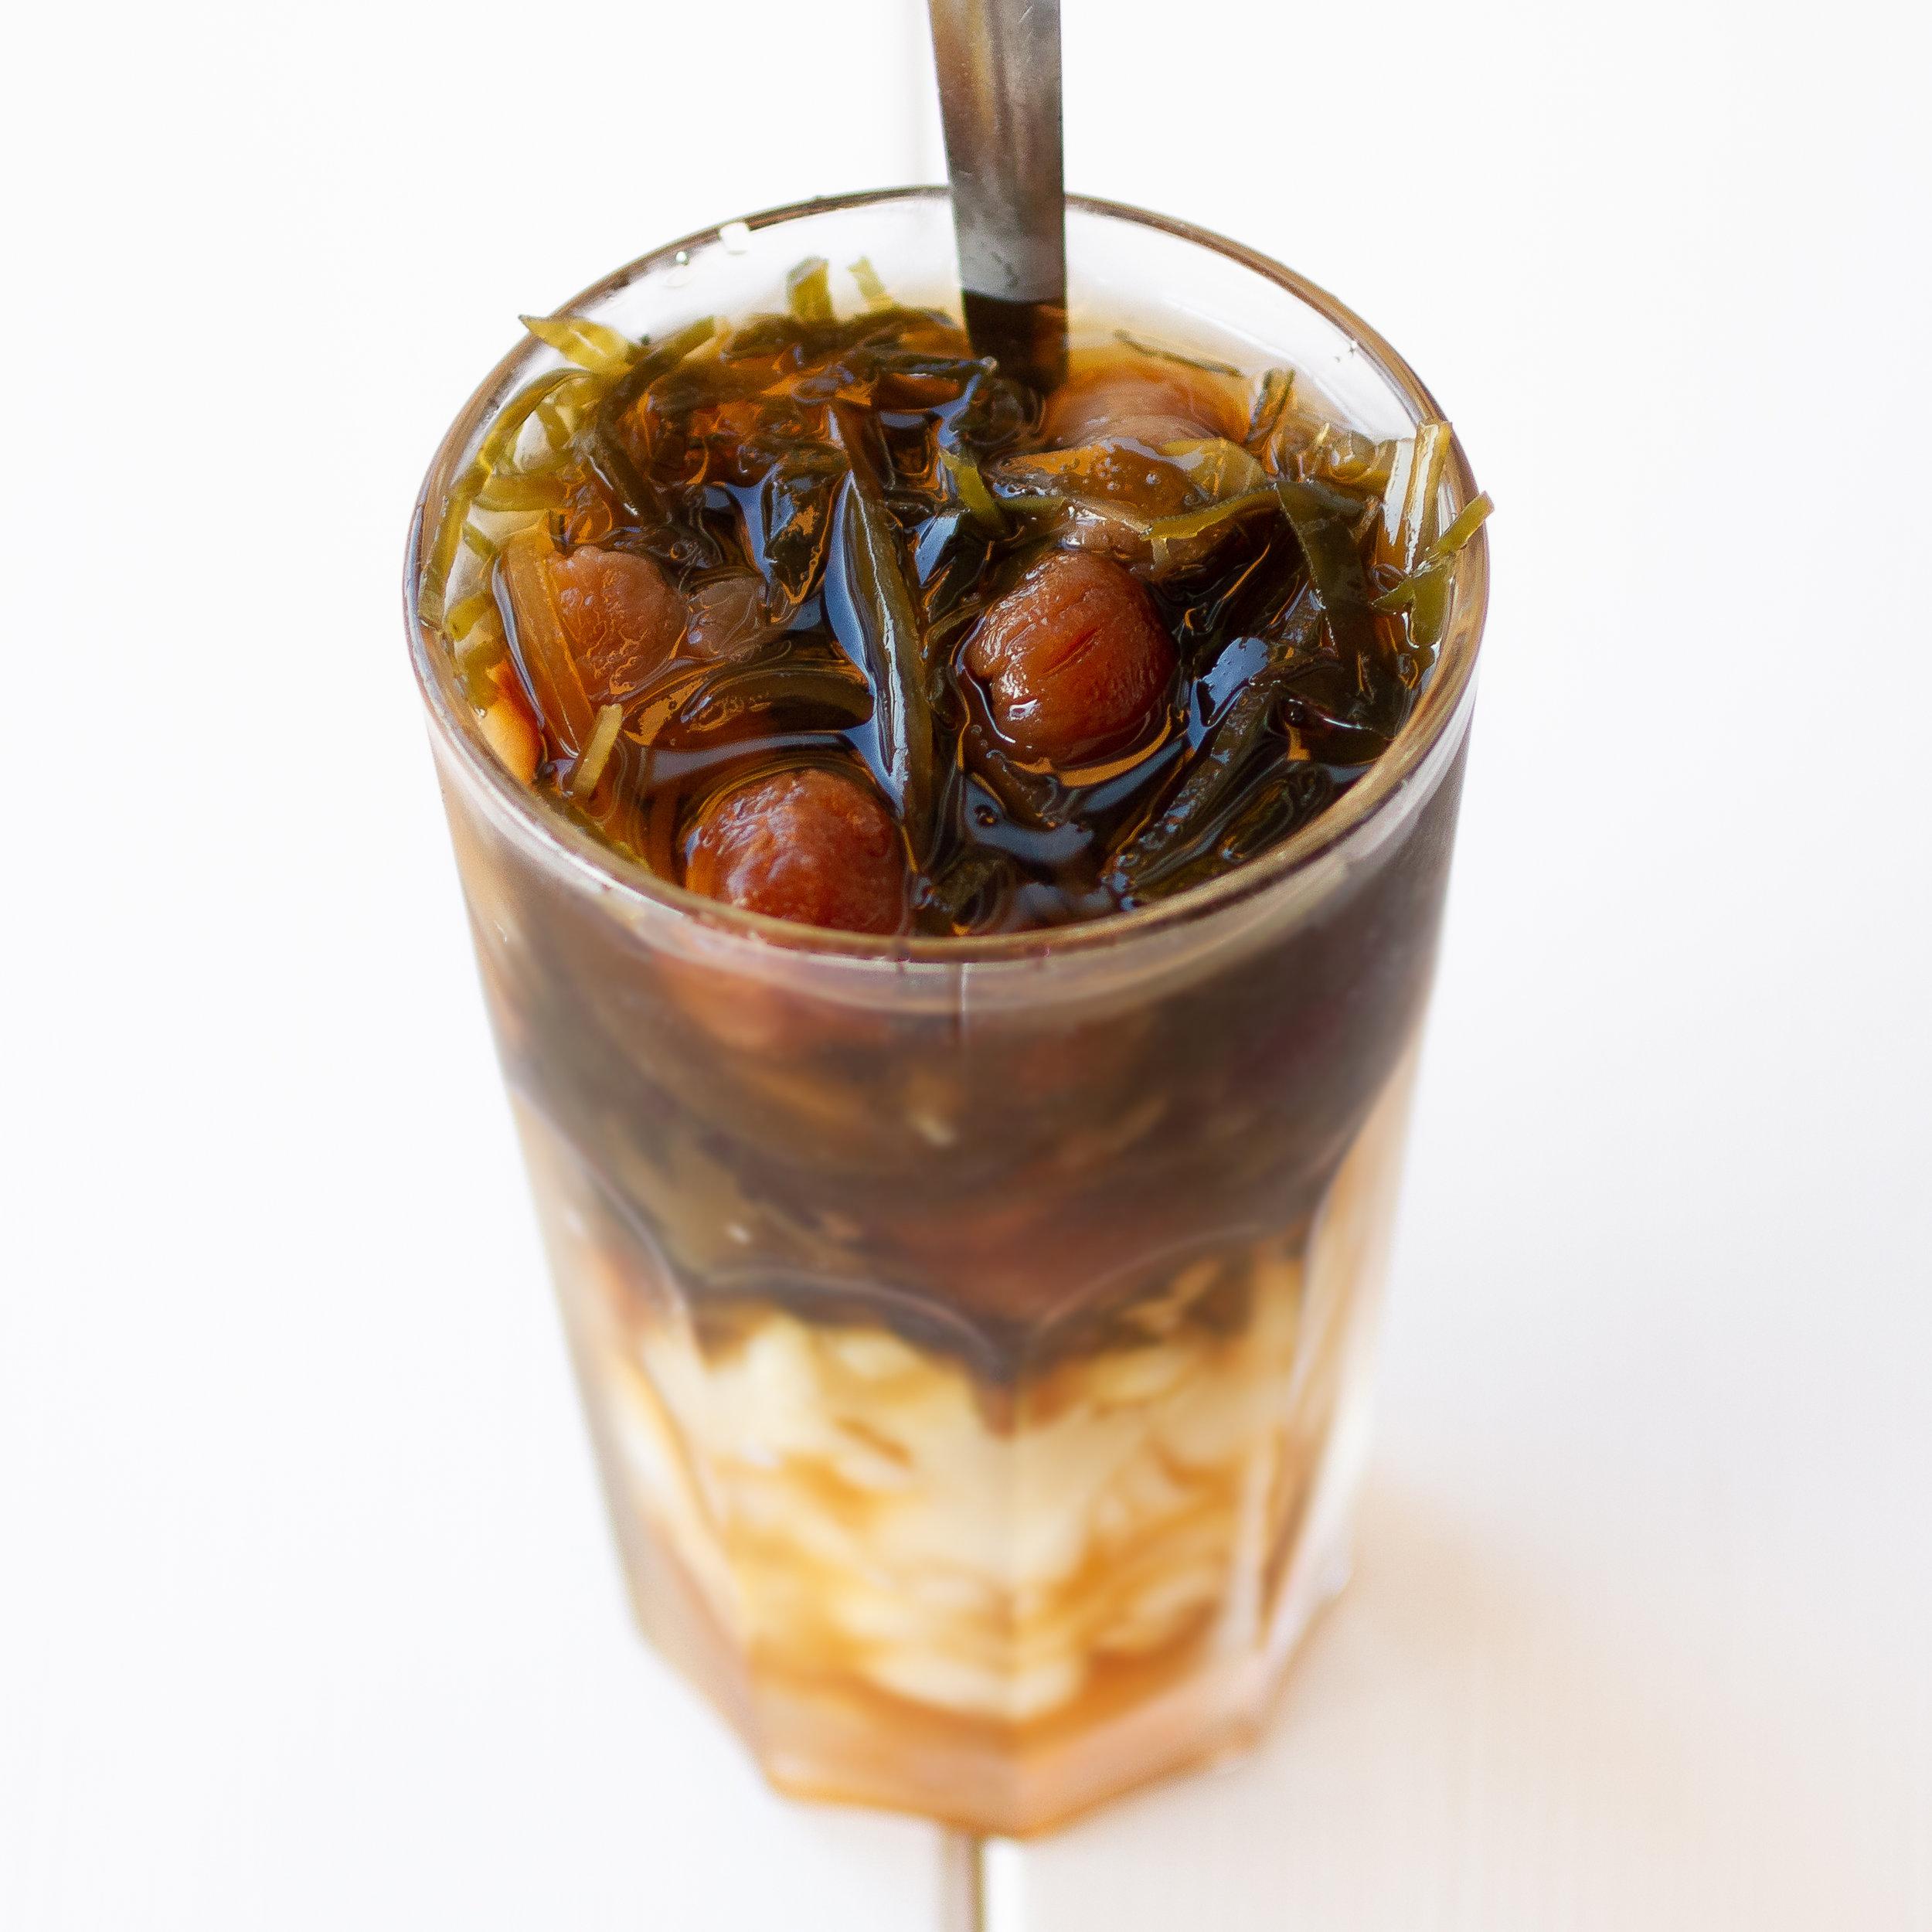 Vietnamese Refreshing Iced Dessert Drink with Seaweed, Lotus Seeds, Jujube, Longan and Pearl Barley (Che Sam Bo Luong)